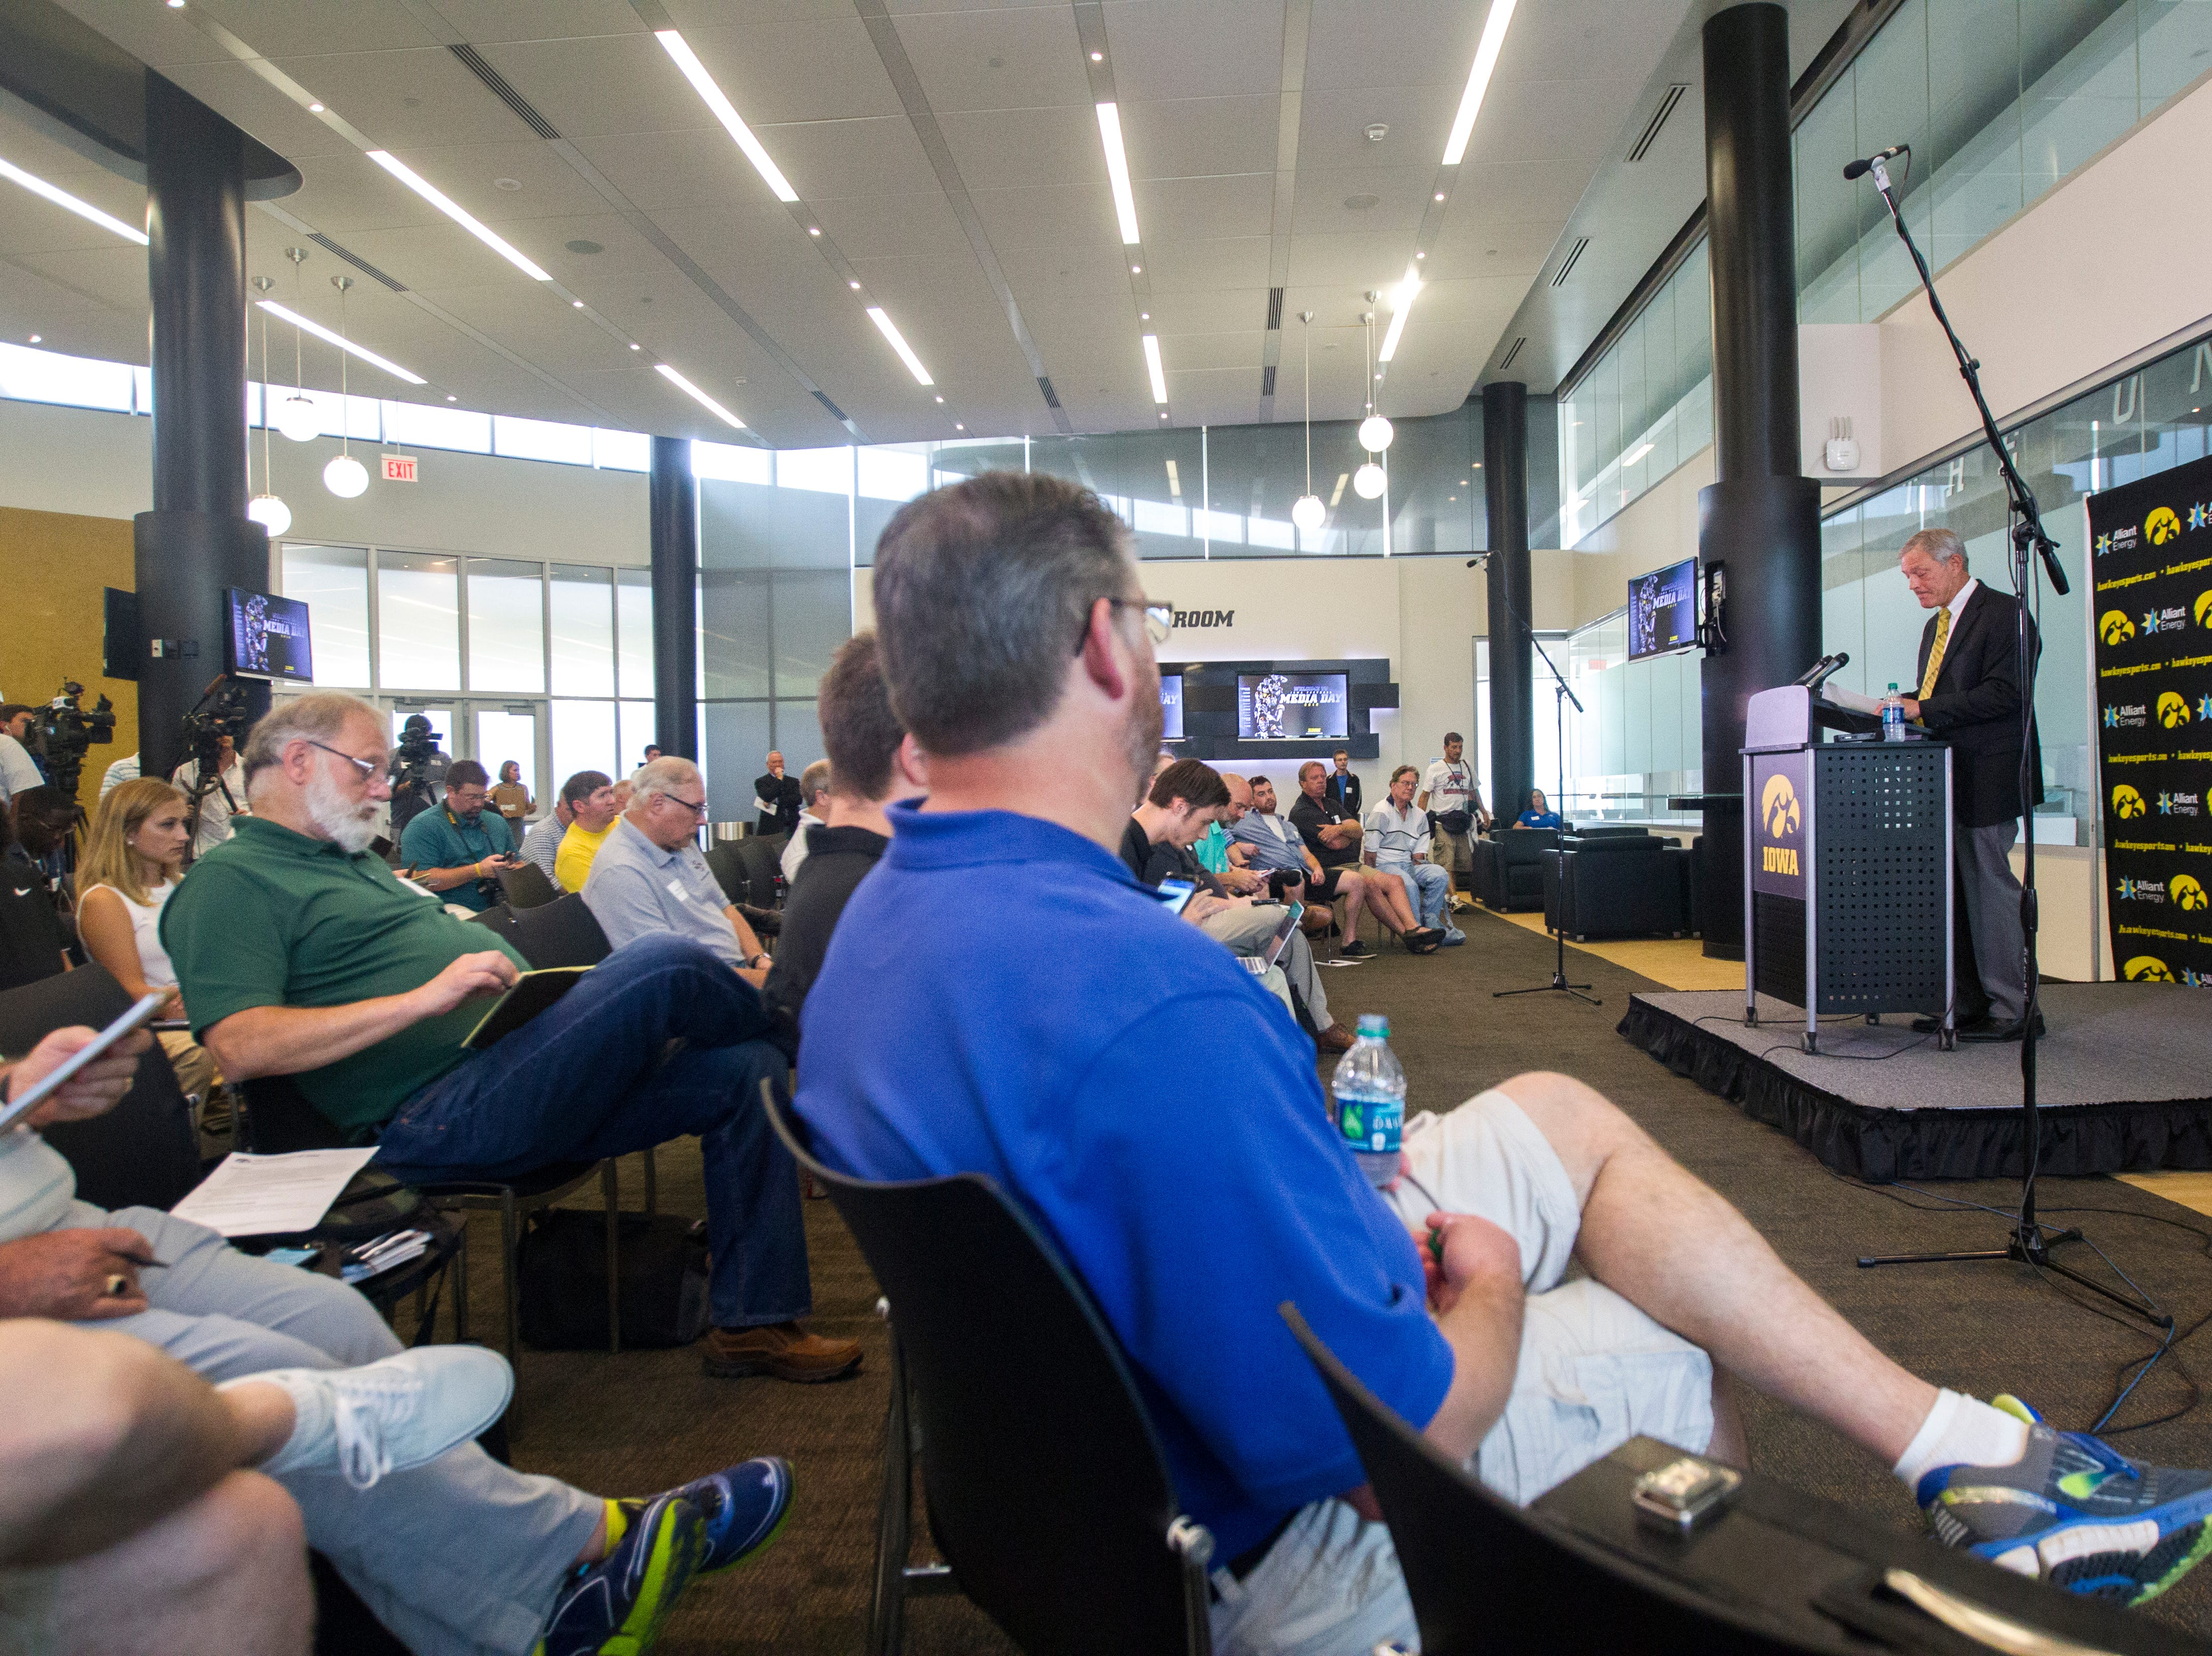 Iowa head coach Kirk Ferentz speaks to reporters during Iowa football media day on Friday, Aug. 10, 2018, in Carver-Hawkeye Arena in Iowa City.